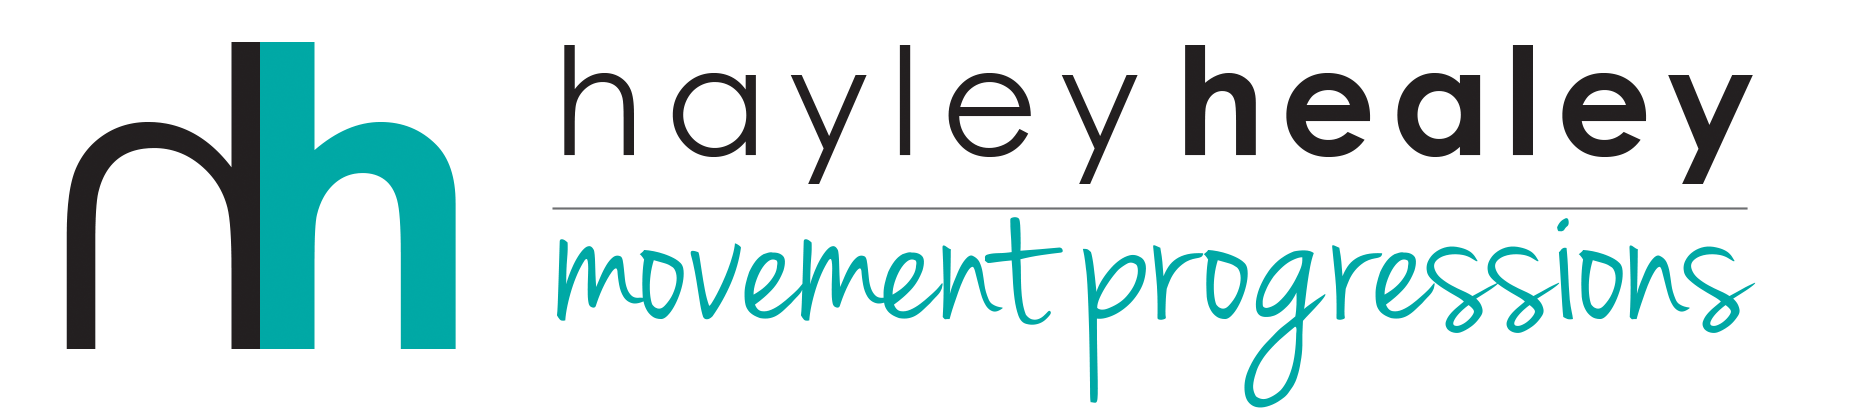 hayleyhealey mvmt prog logo.png